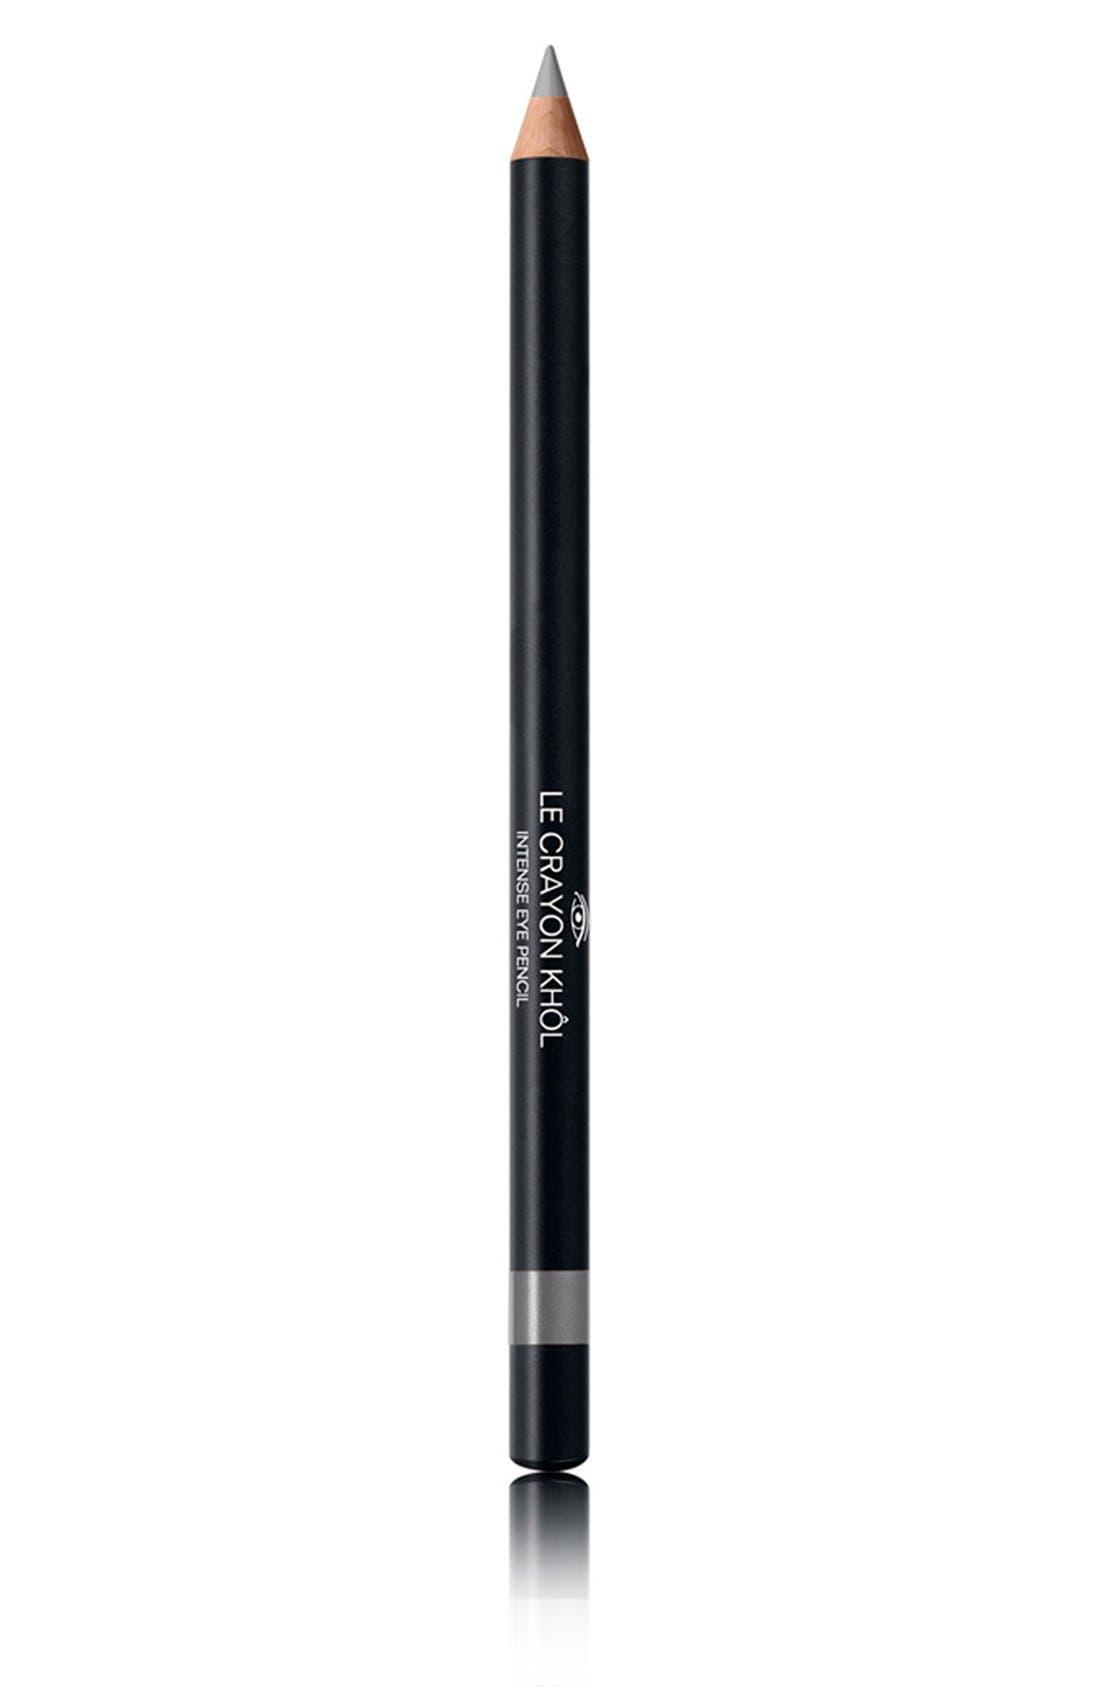 LE CRAYON KHÔL<br />Intense Eye Pencil,                         Main,                         color, 64 GRAPHITE